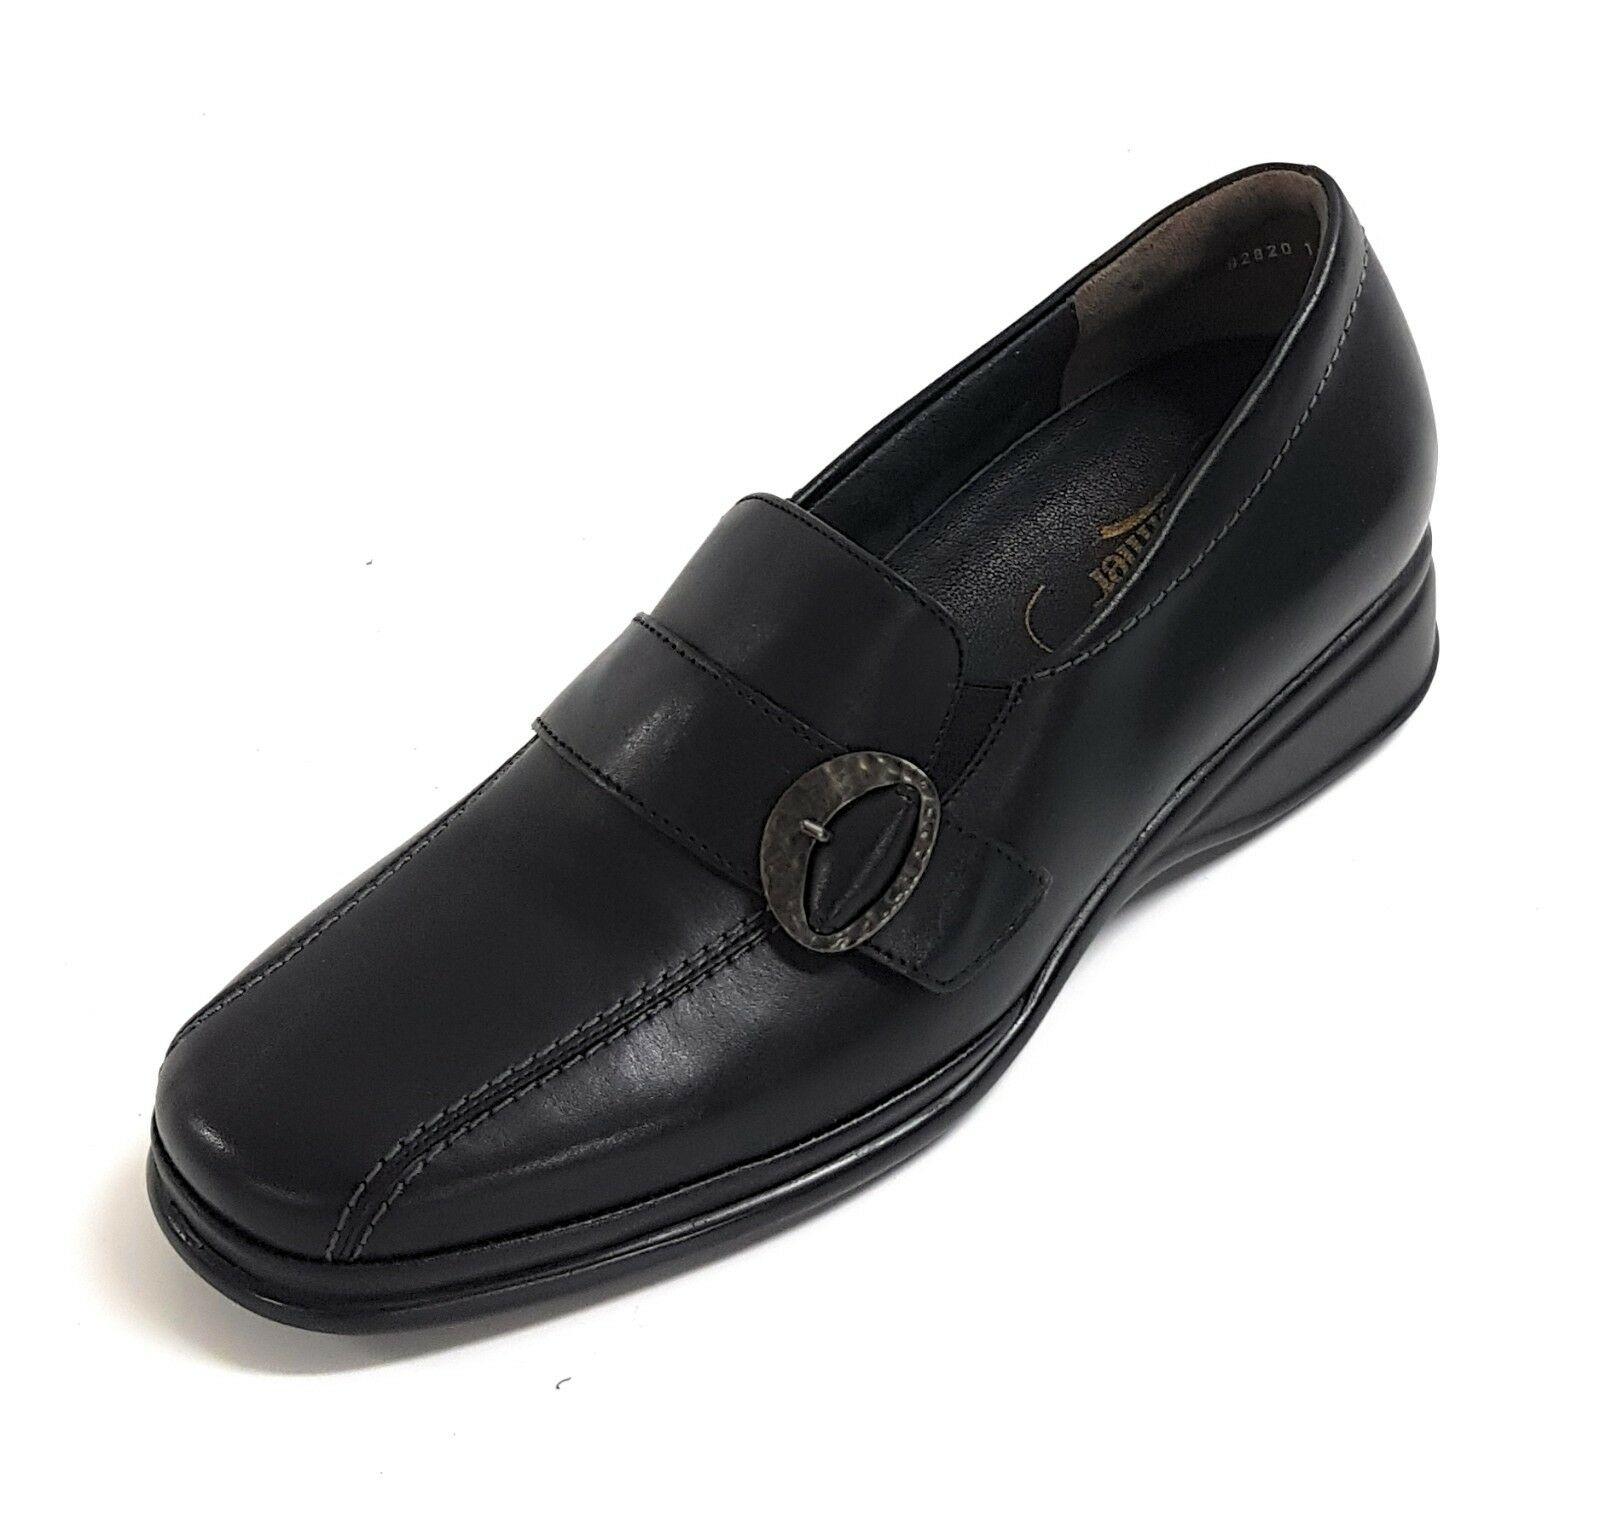 Semler Semler Semler Ria Damen Damens Schuhe Slipper Sneaker Halbschuh PU-Luftpolstersohle 28202c